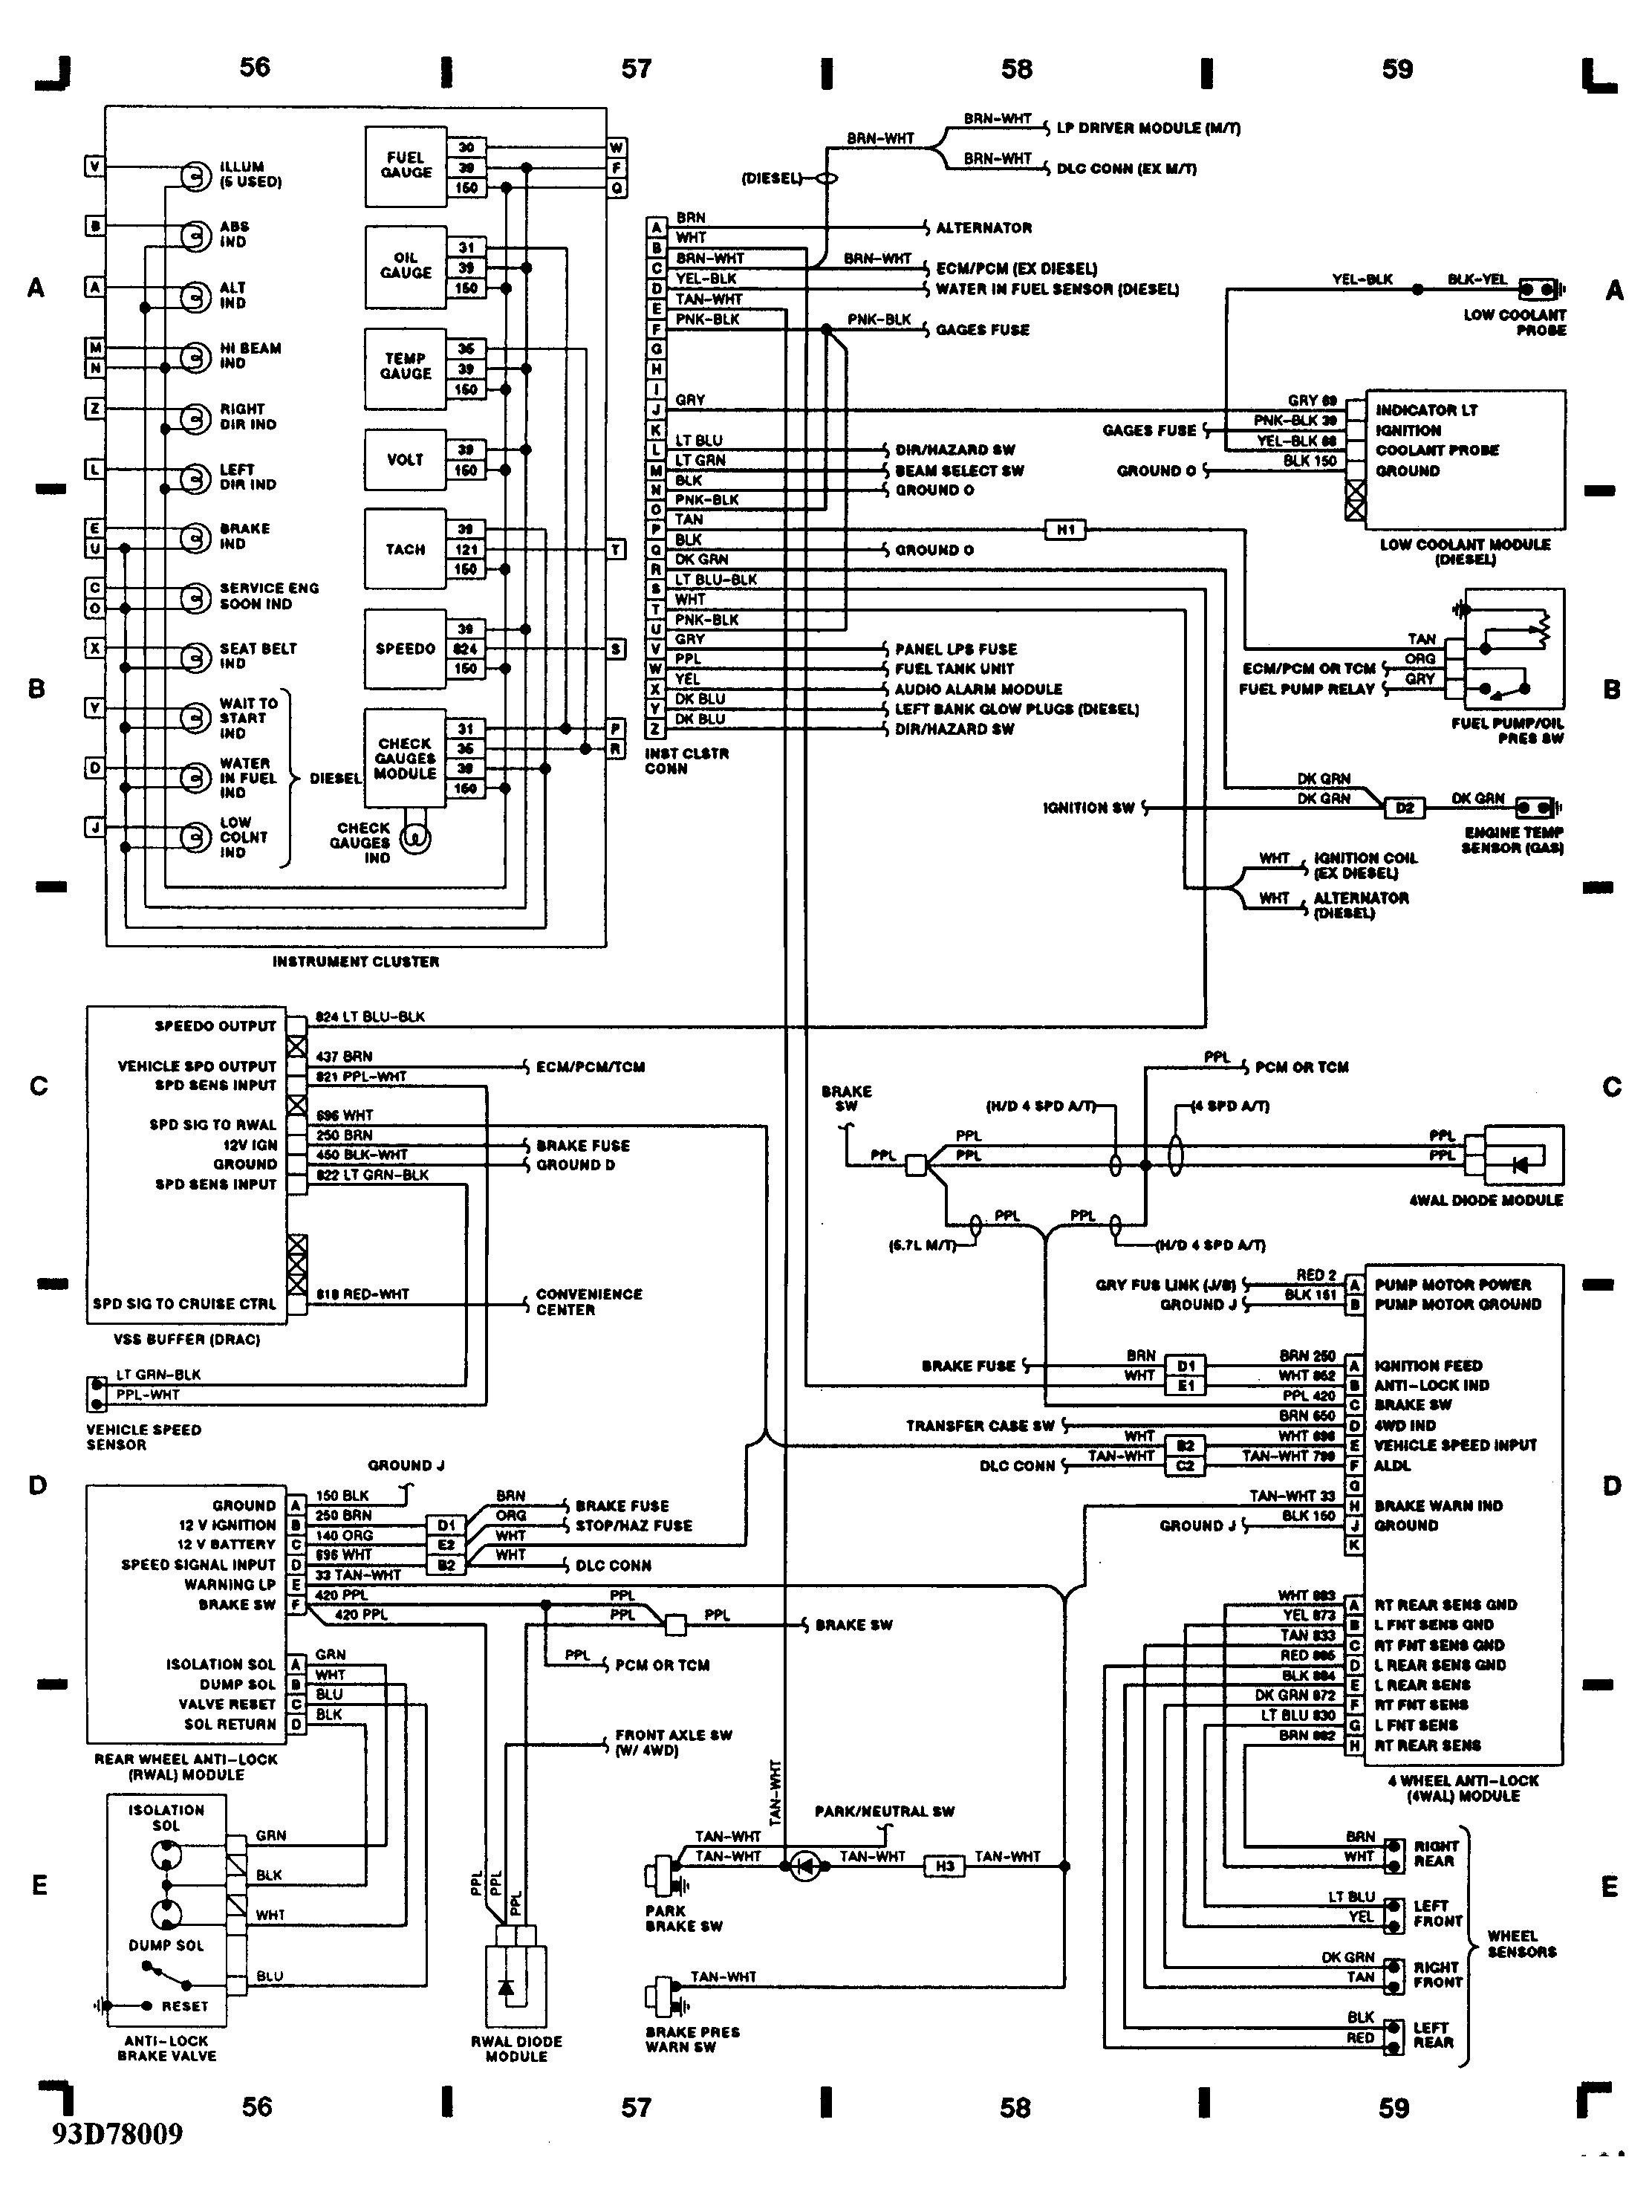 96 Chevy S10 Wiring Diagram | Wiring Diagram Sort straw | Chevrolet Wiring Diagram Dlc |  | wiring diagram library